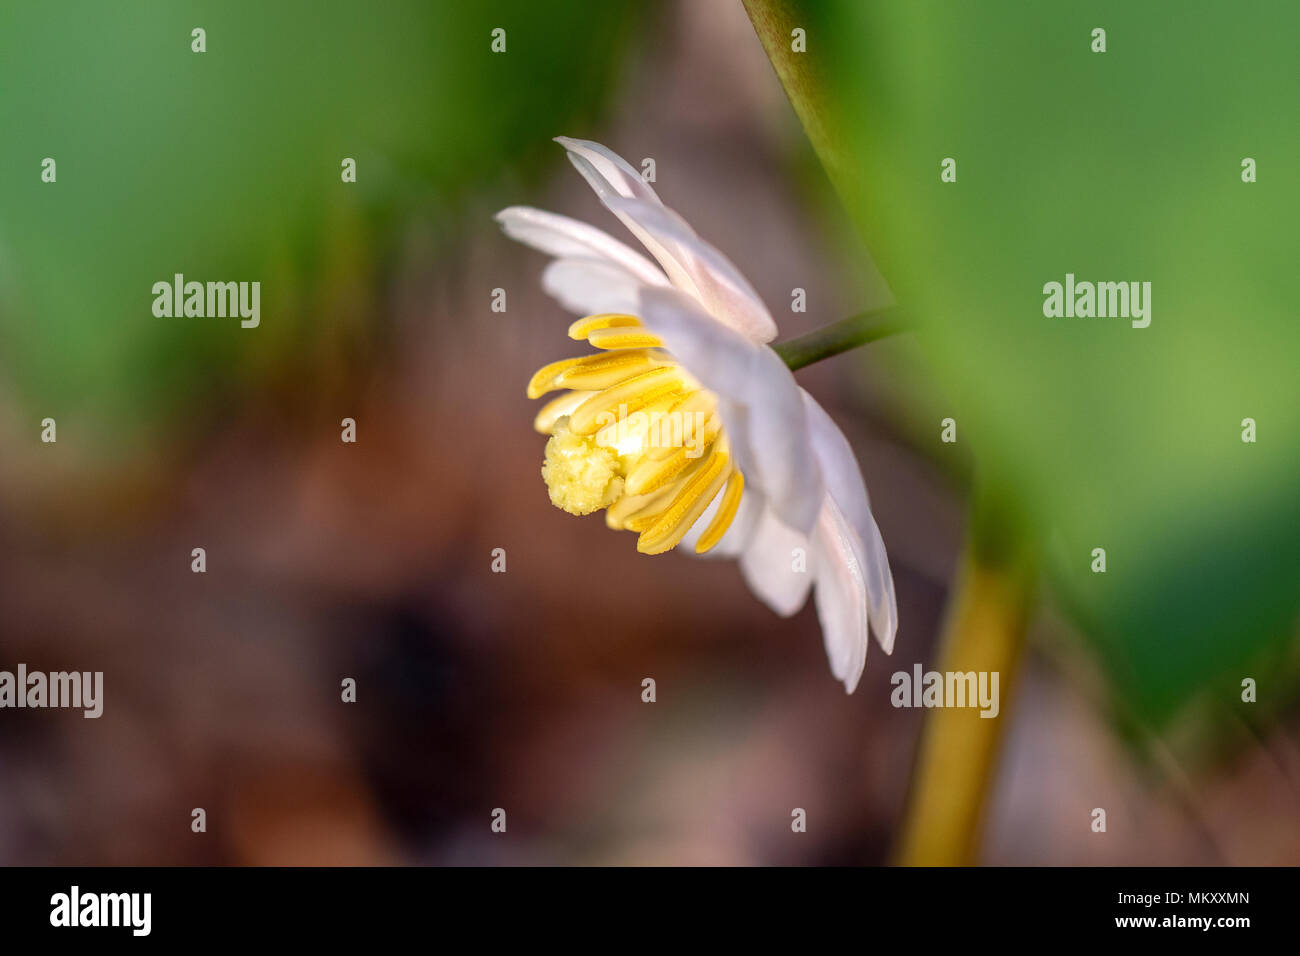 Mayapple Flower (Podophyllum peltatum) - Holmes Educational State Forest, Hendersonville, North Carolina, USA Stock Photo